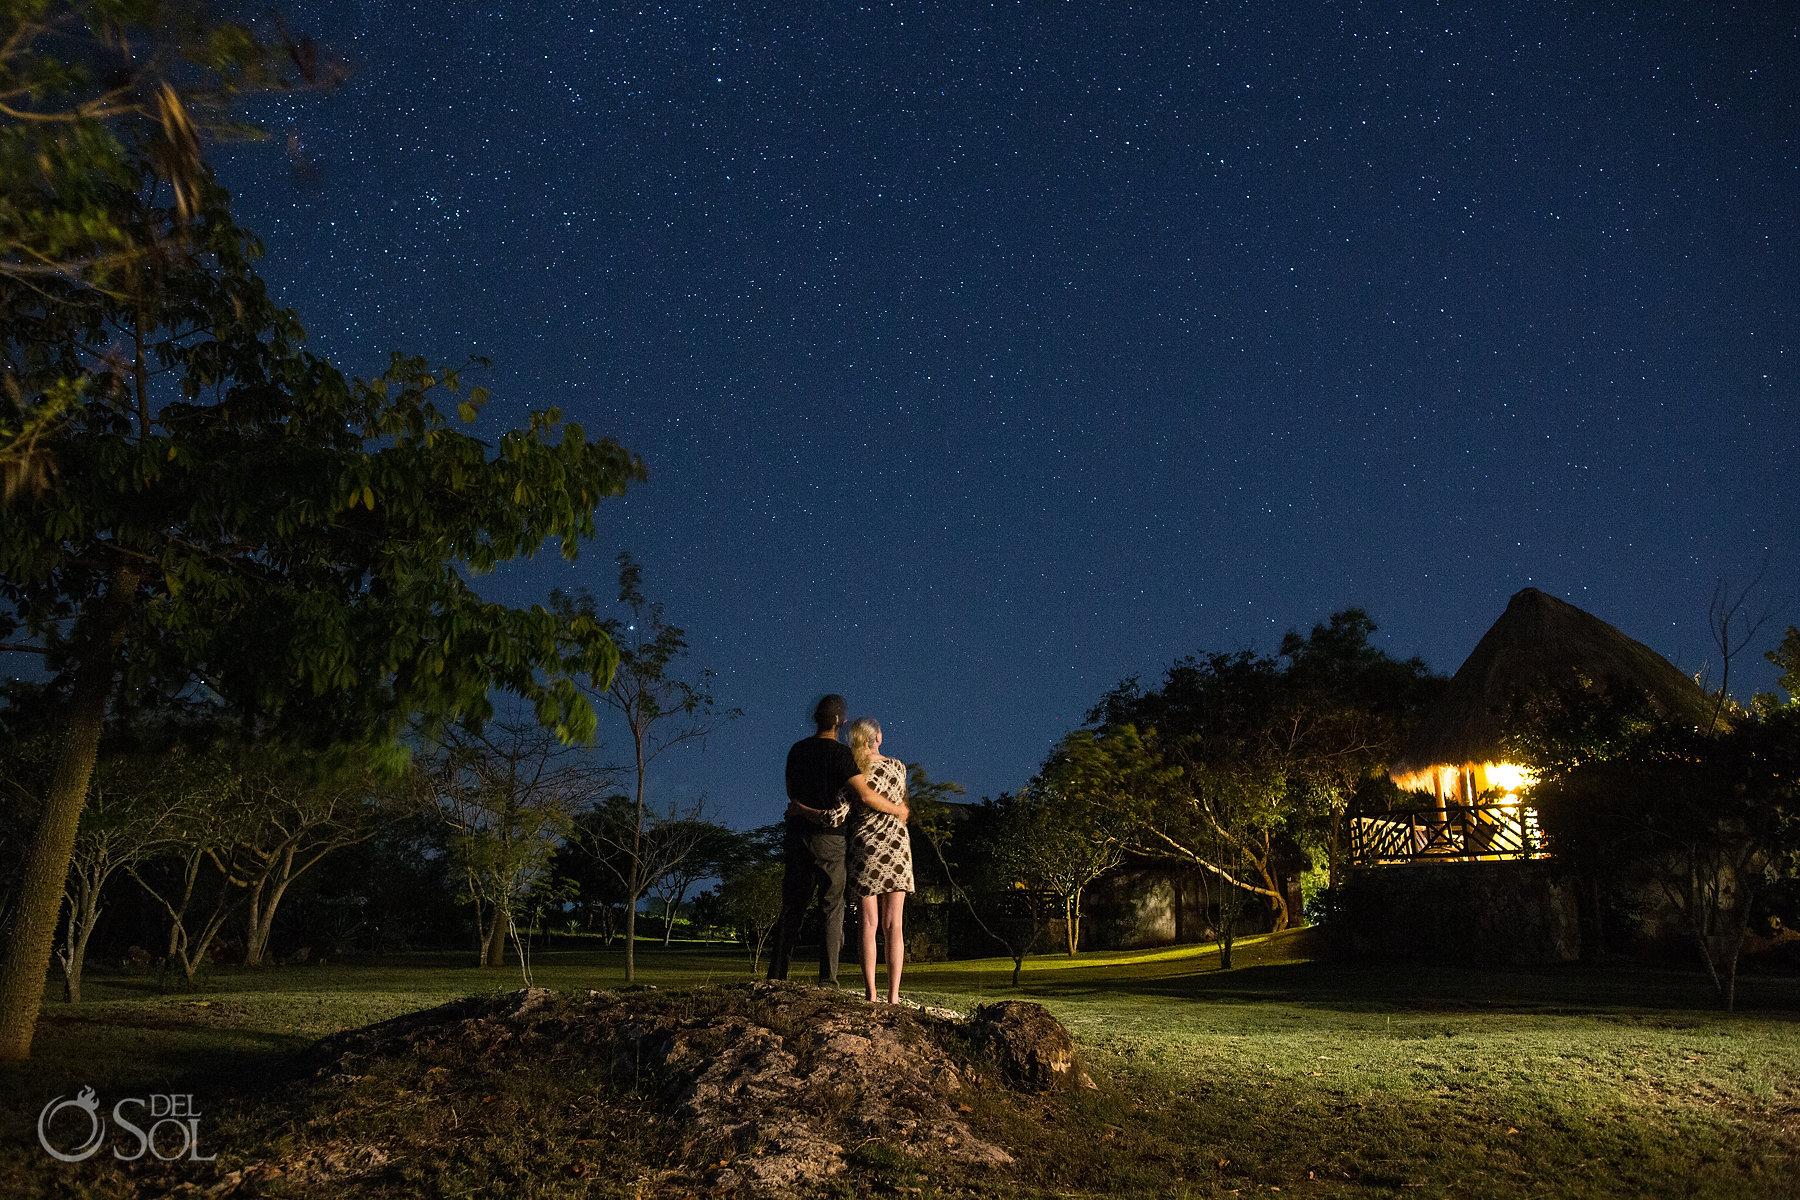 Starry night birthday ideas Yucatan Mexico